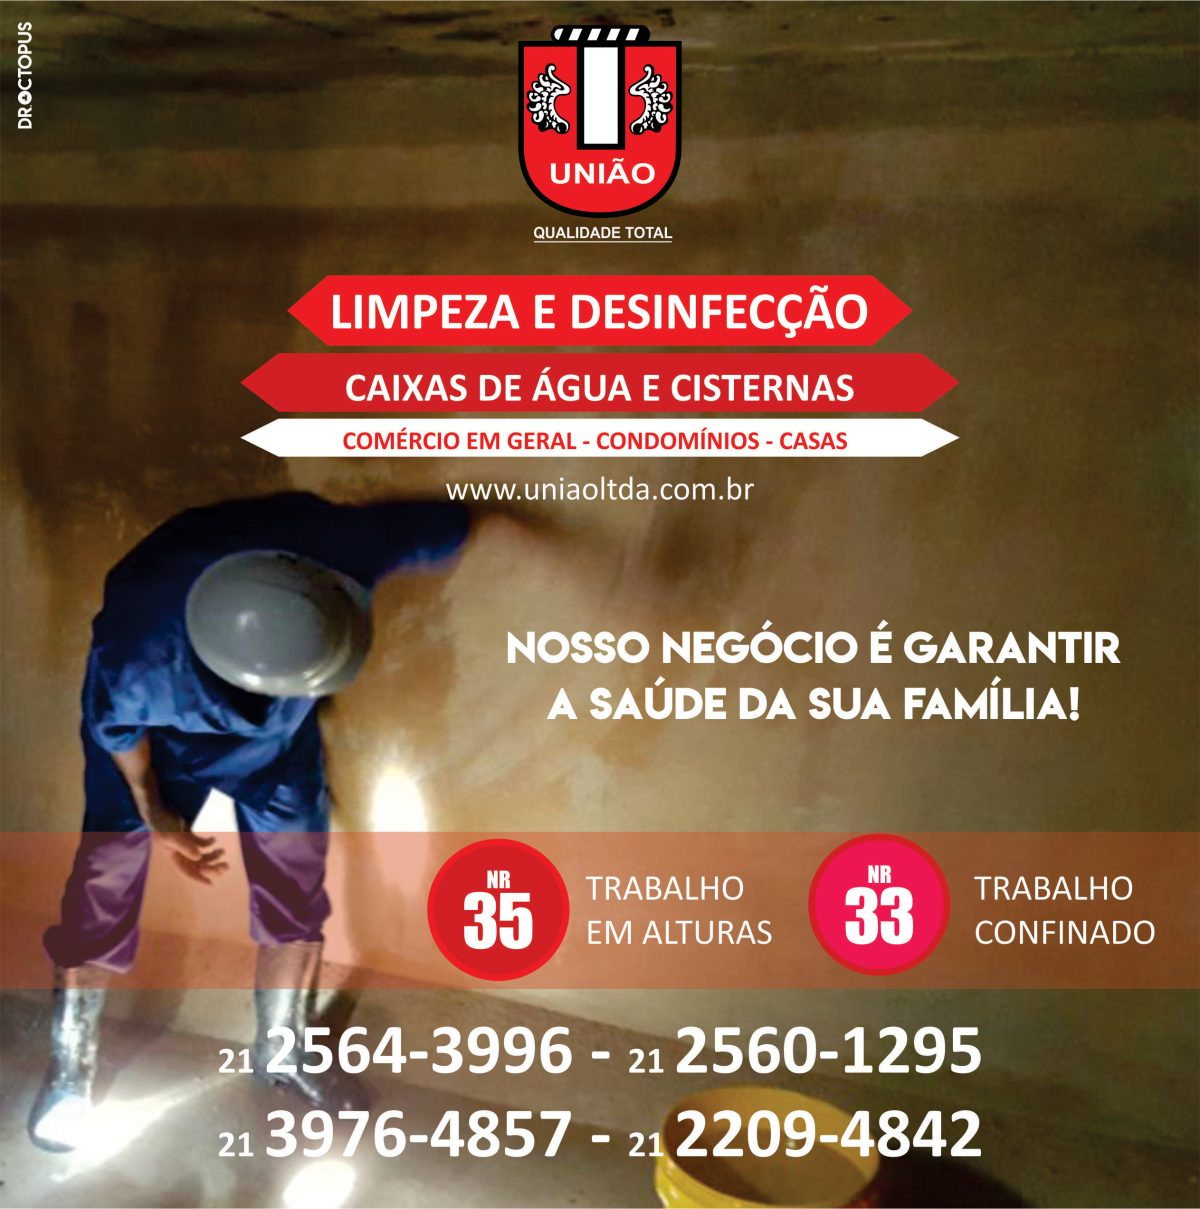 UNIAO-LTDA-limpeza-desinfeccao2020-2